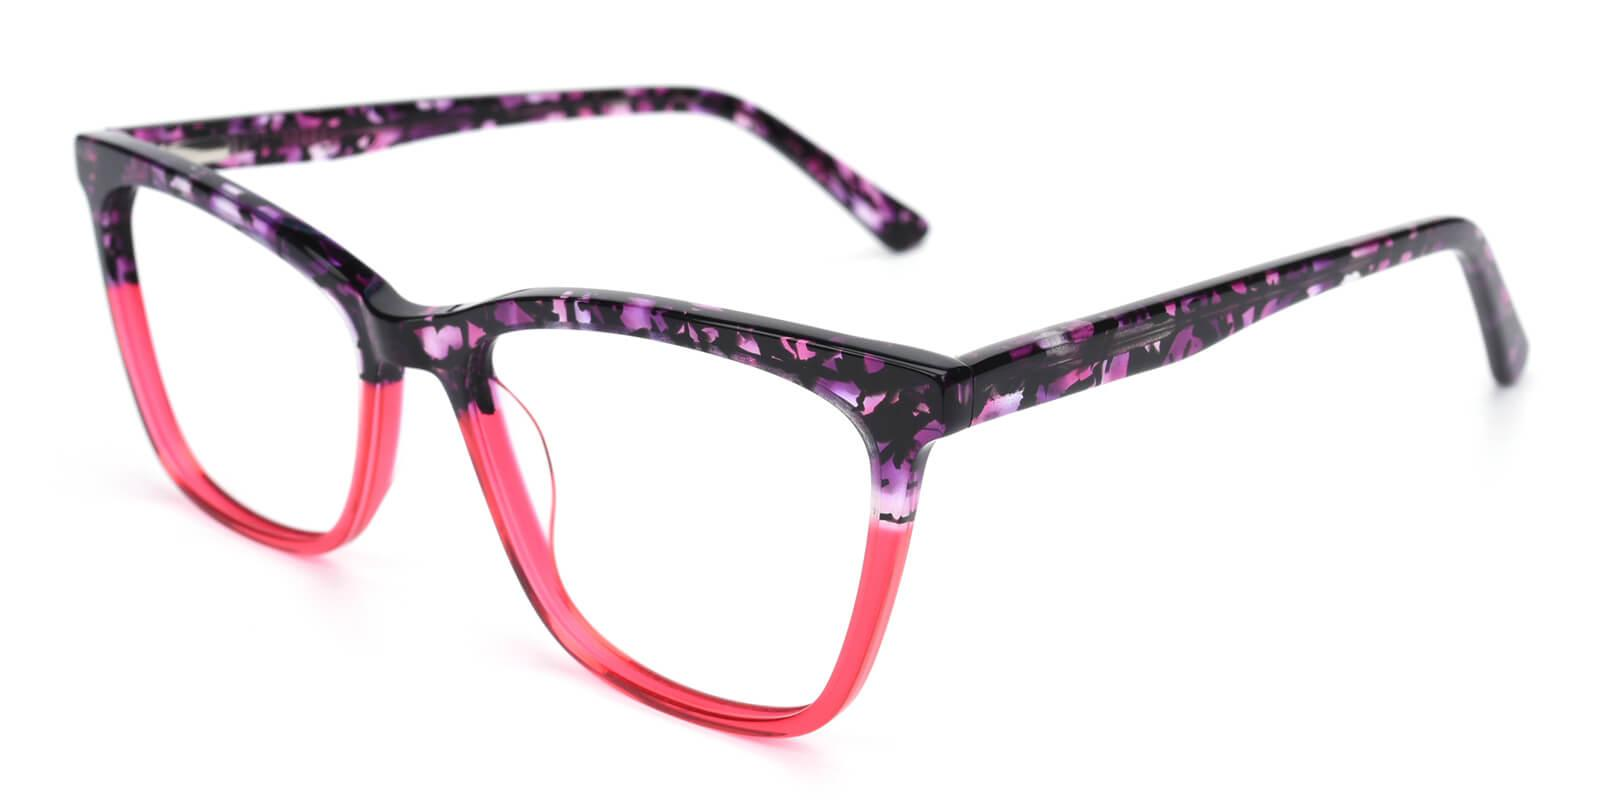 Beatrice-Red-Cat-Acetate-Eyeglasses-detail